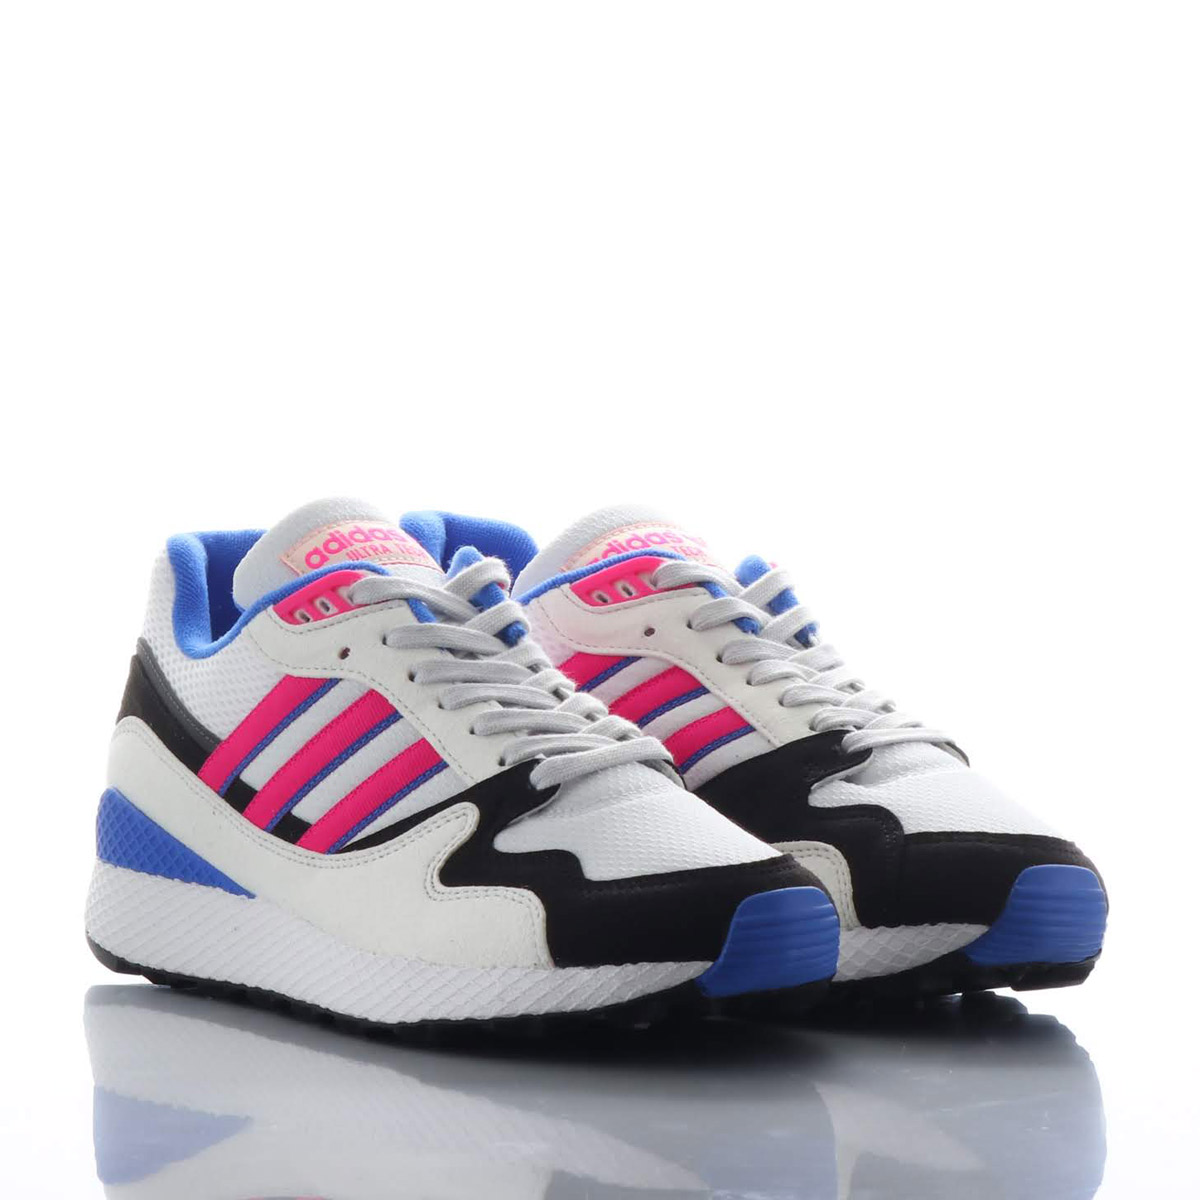 adidas Originals ULTRA TECH(アディダス ウルトラテック)Crystal White/Shock Pink/Core Black【メンズ レディース スニーカー】18FW-I